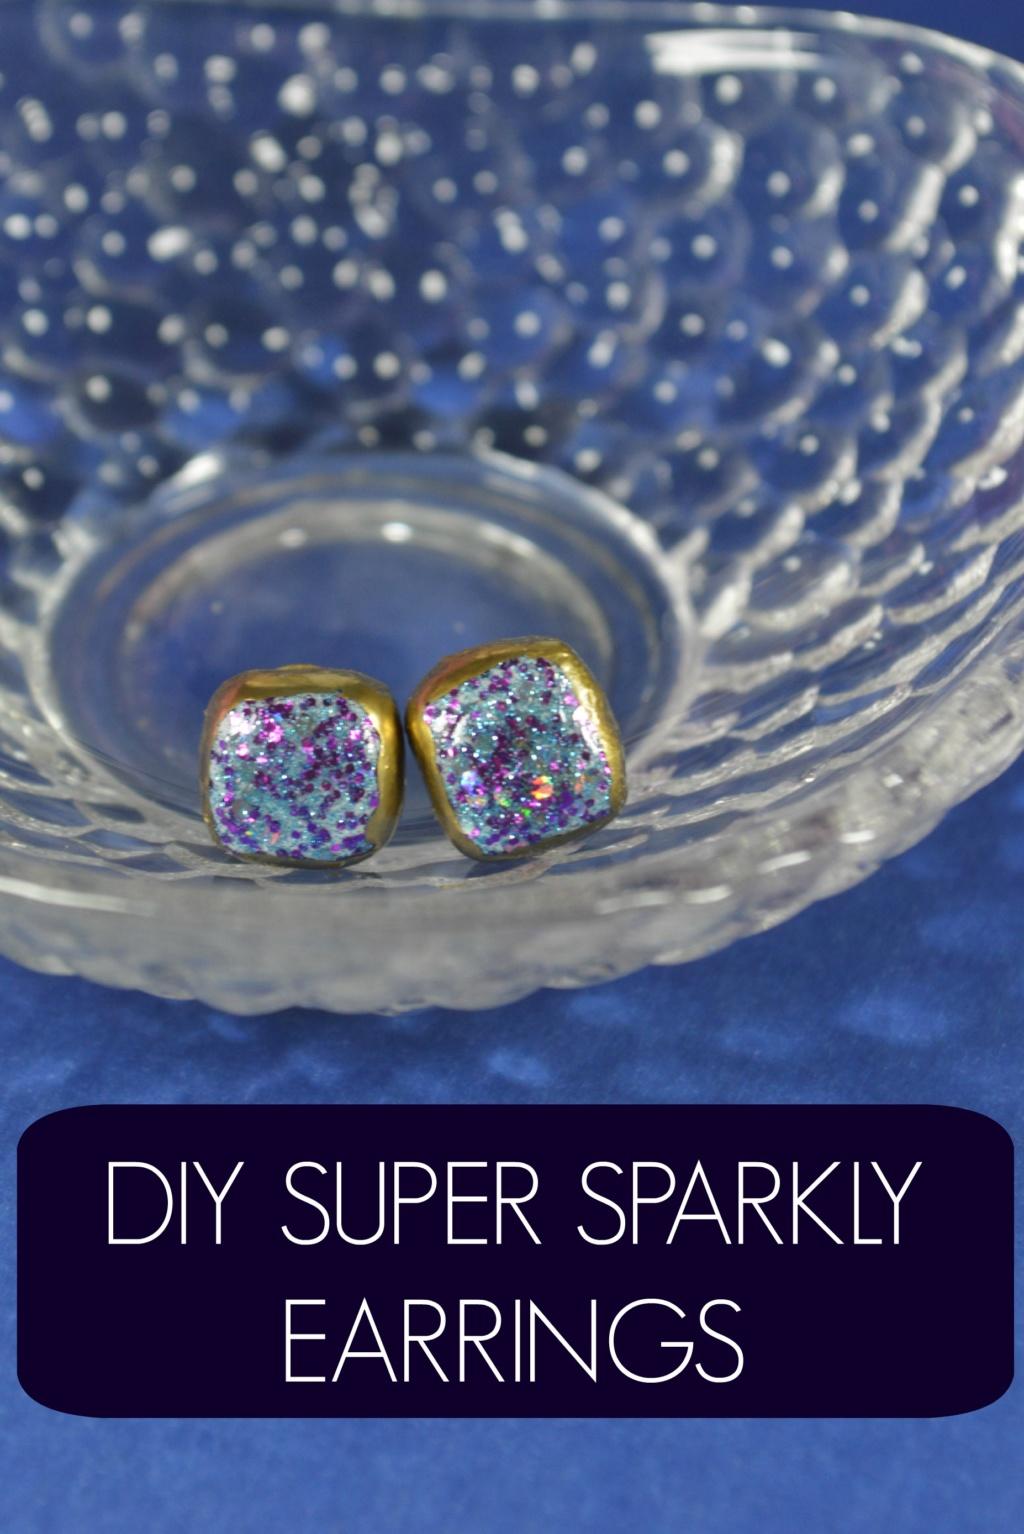 DIY Super Sparkly Earrings